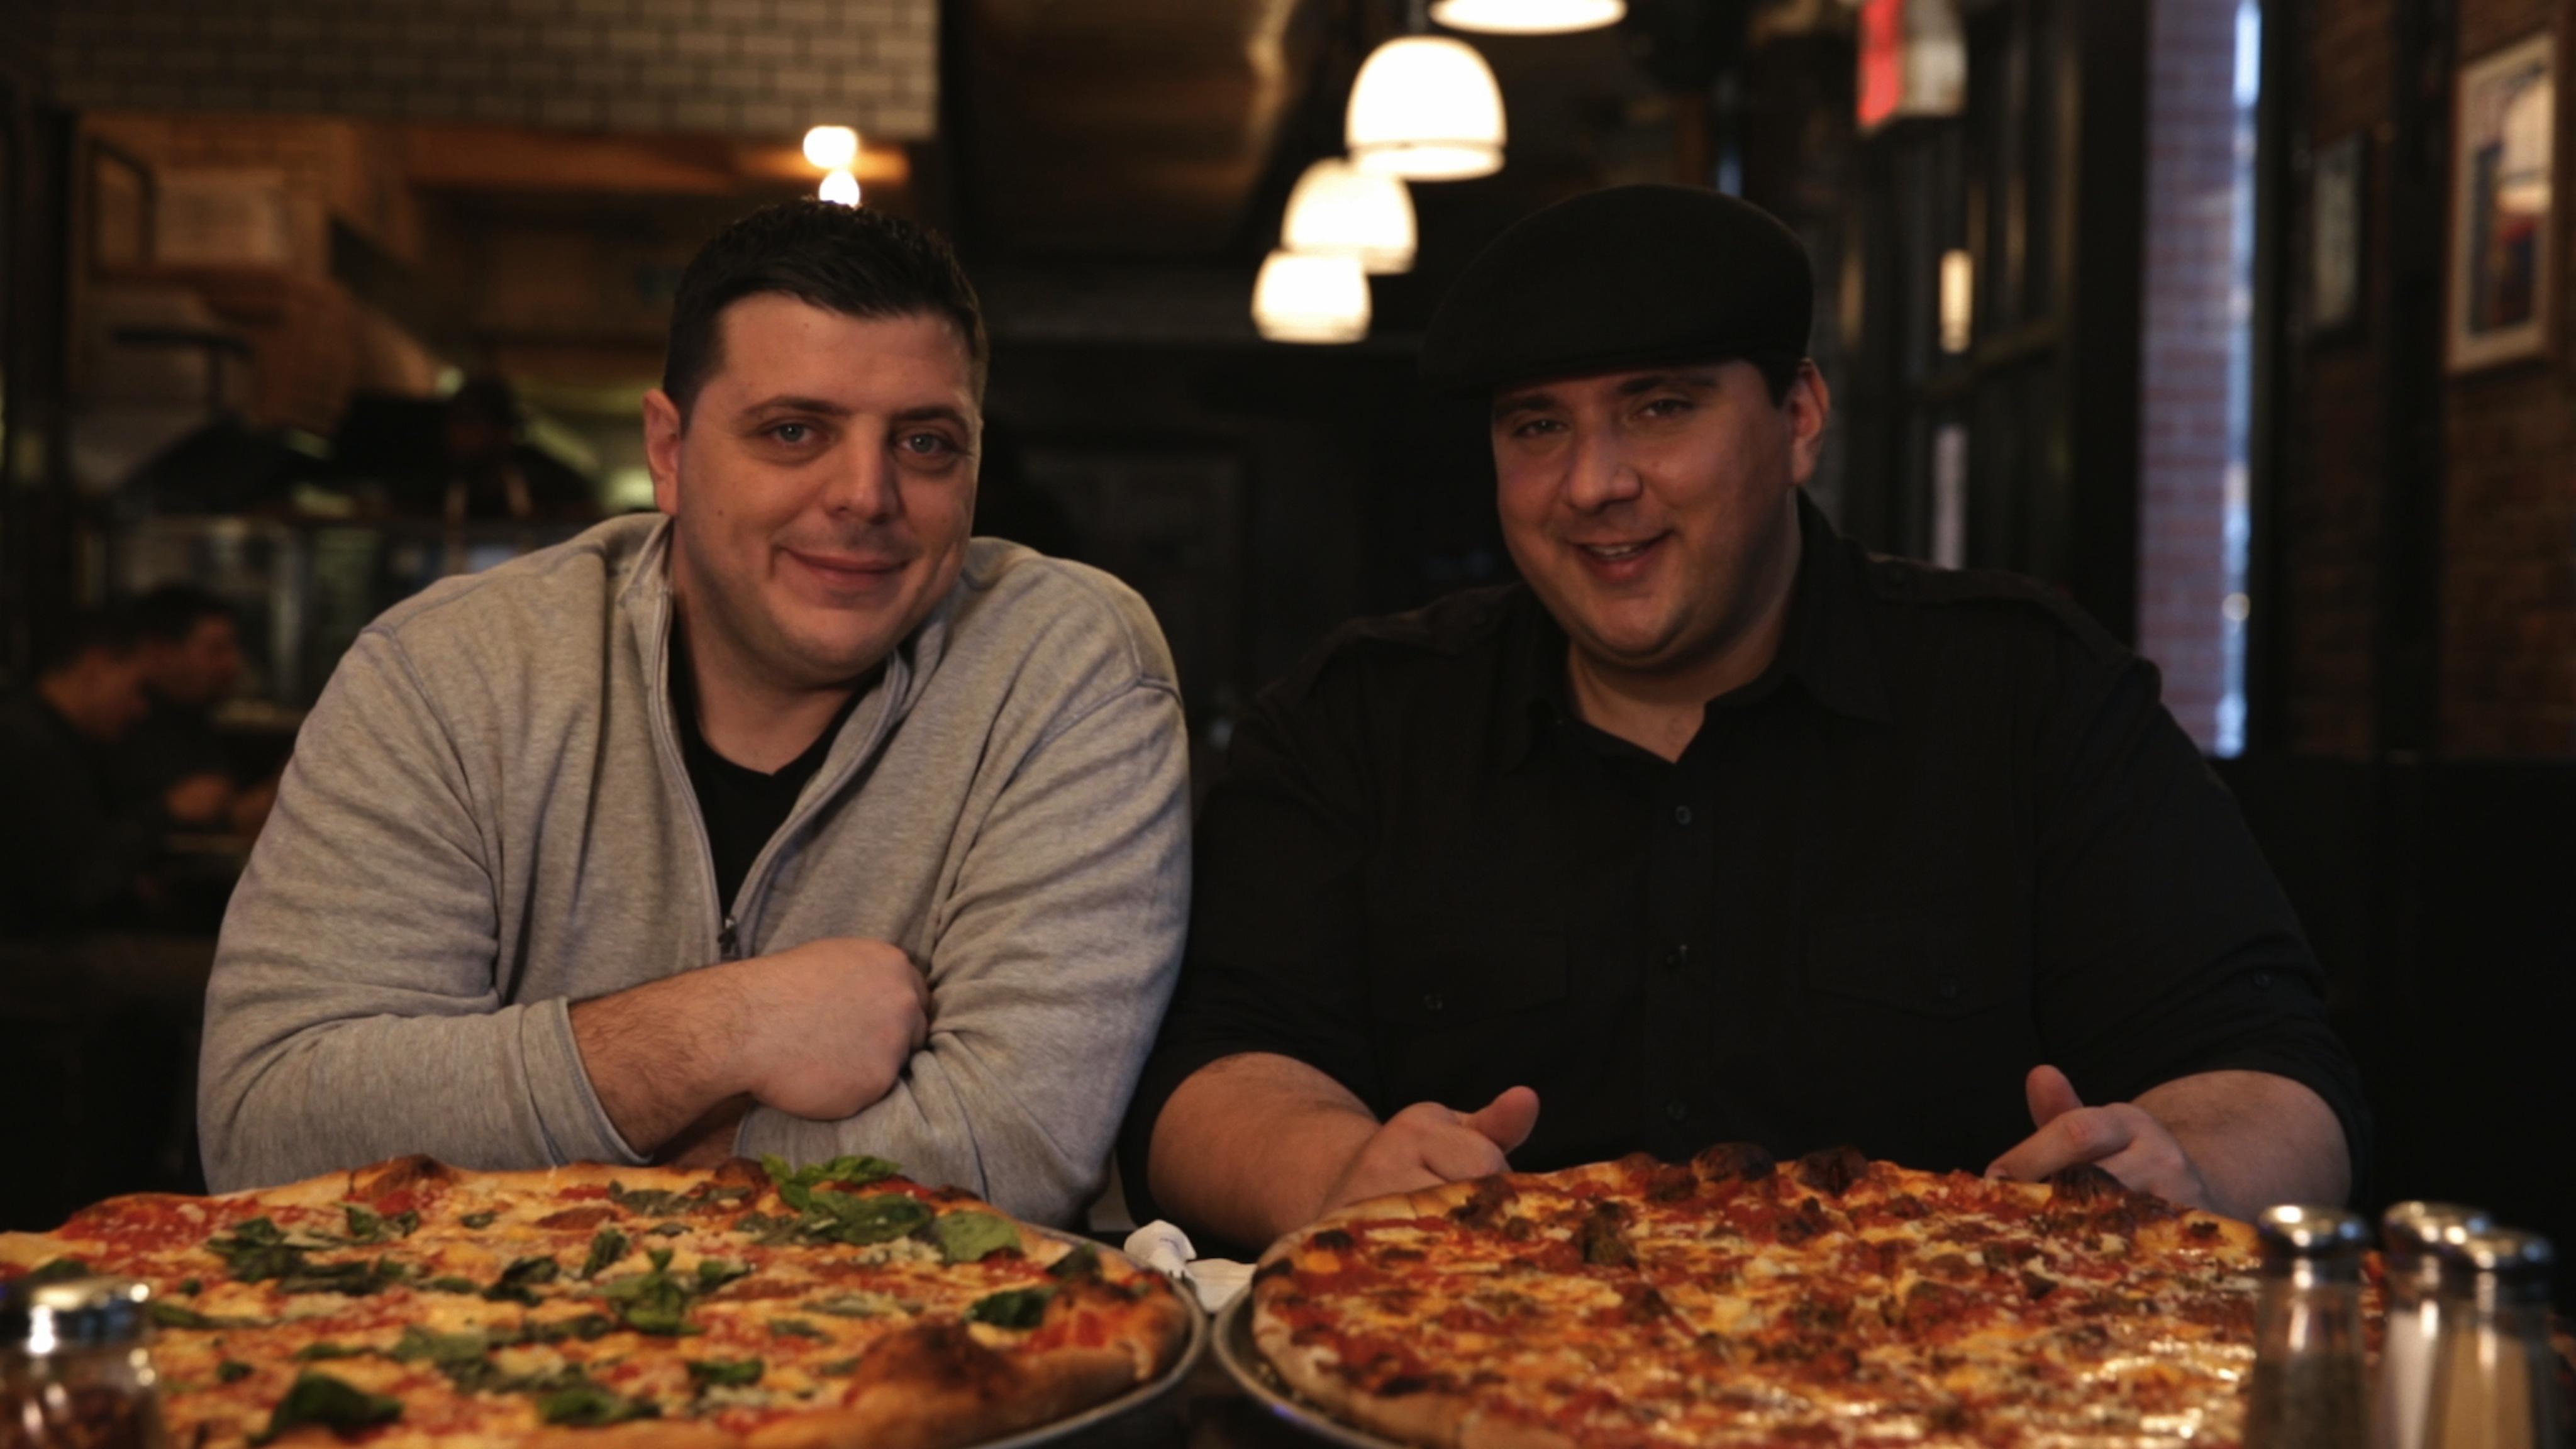 550b5519b3dc9db99d8c_Francis_Garcia_and_Sal_Basille_Cooking_Channel_s_Pizza_Cuz-2.jpg